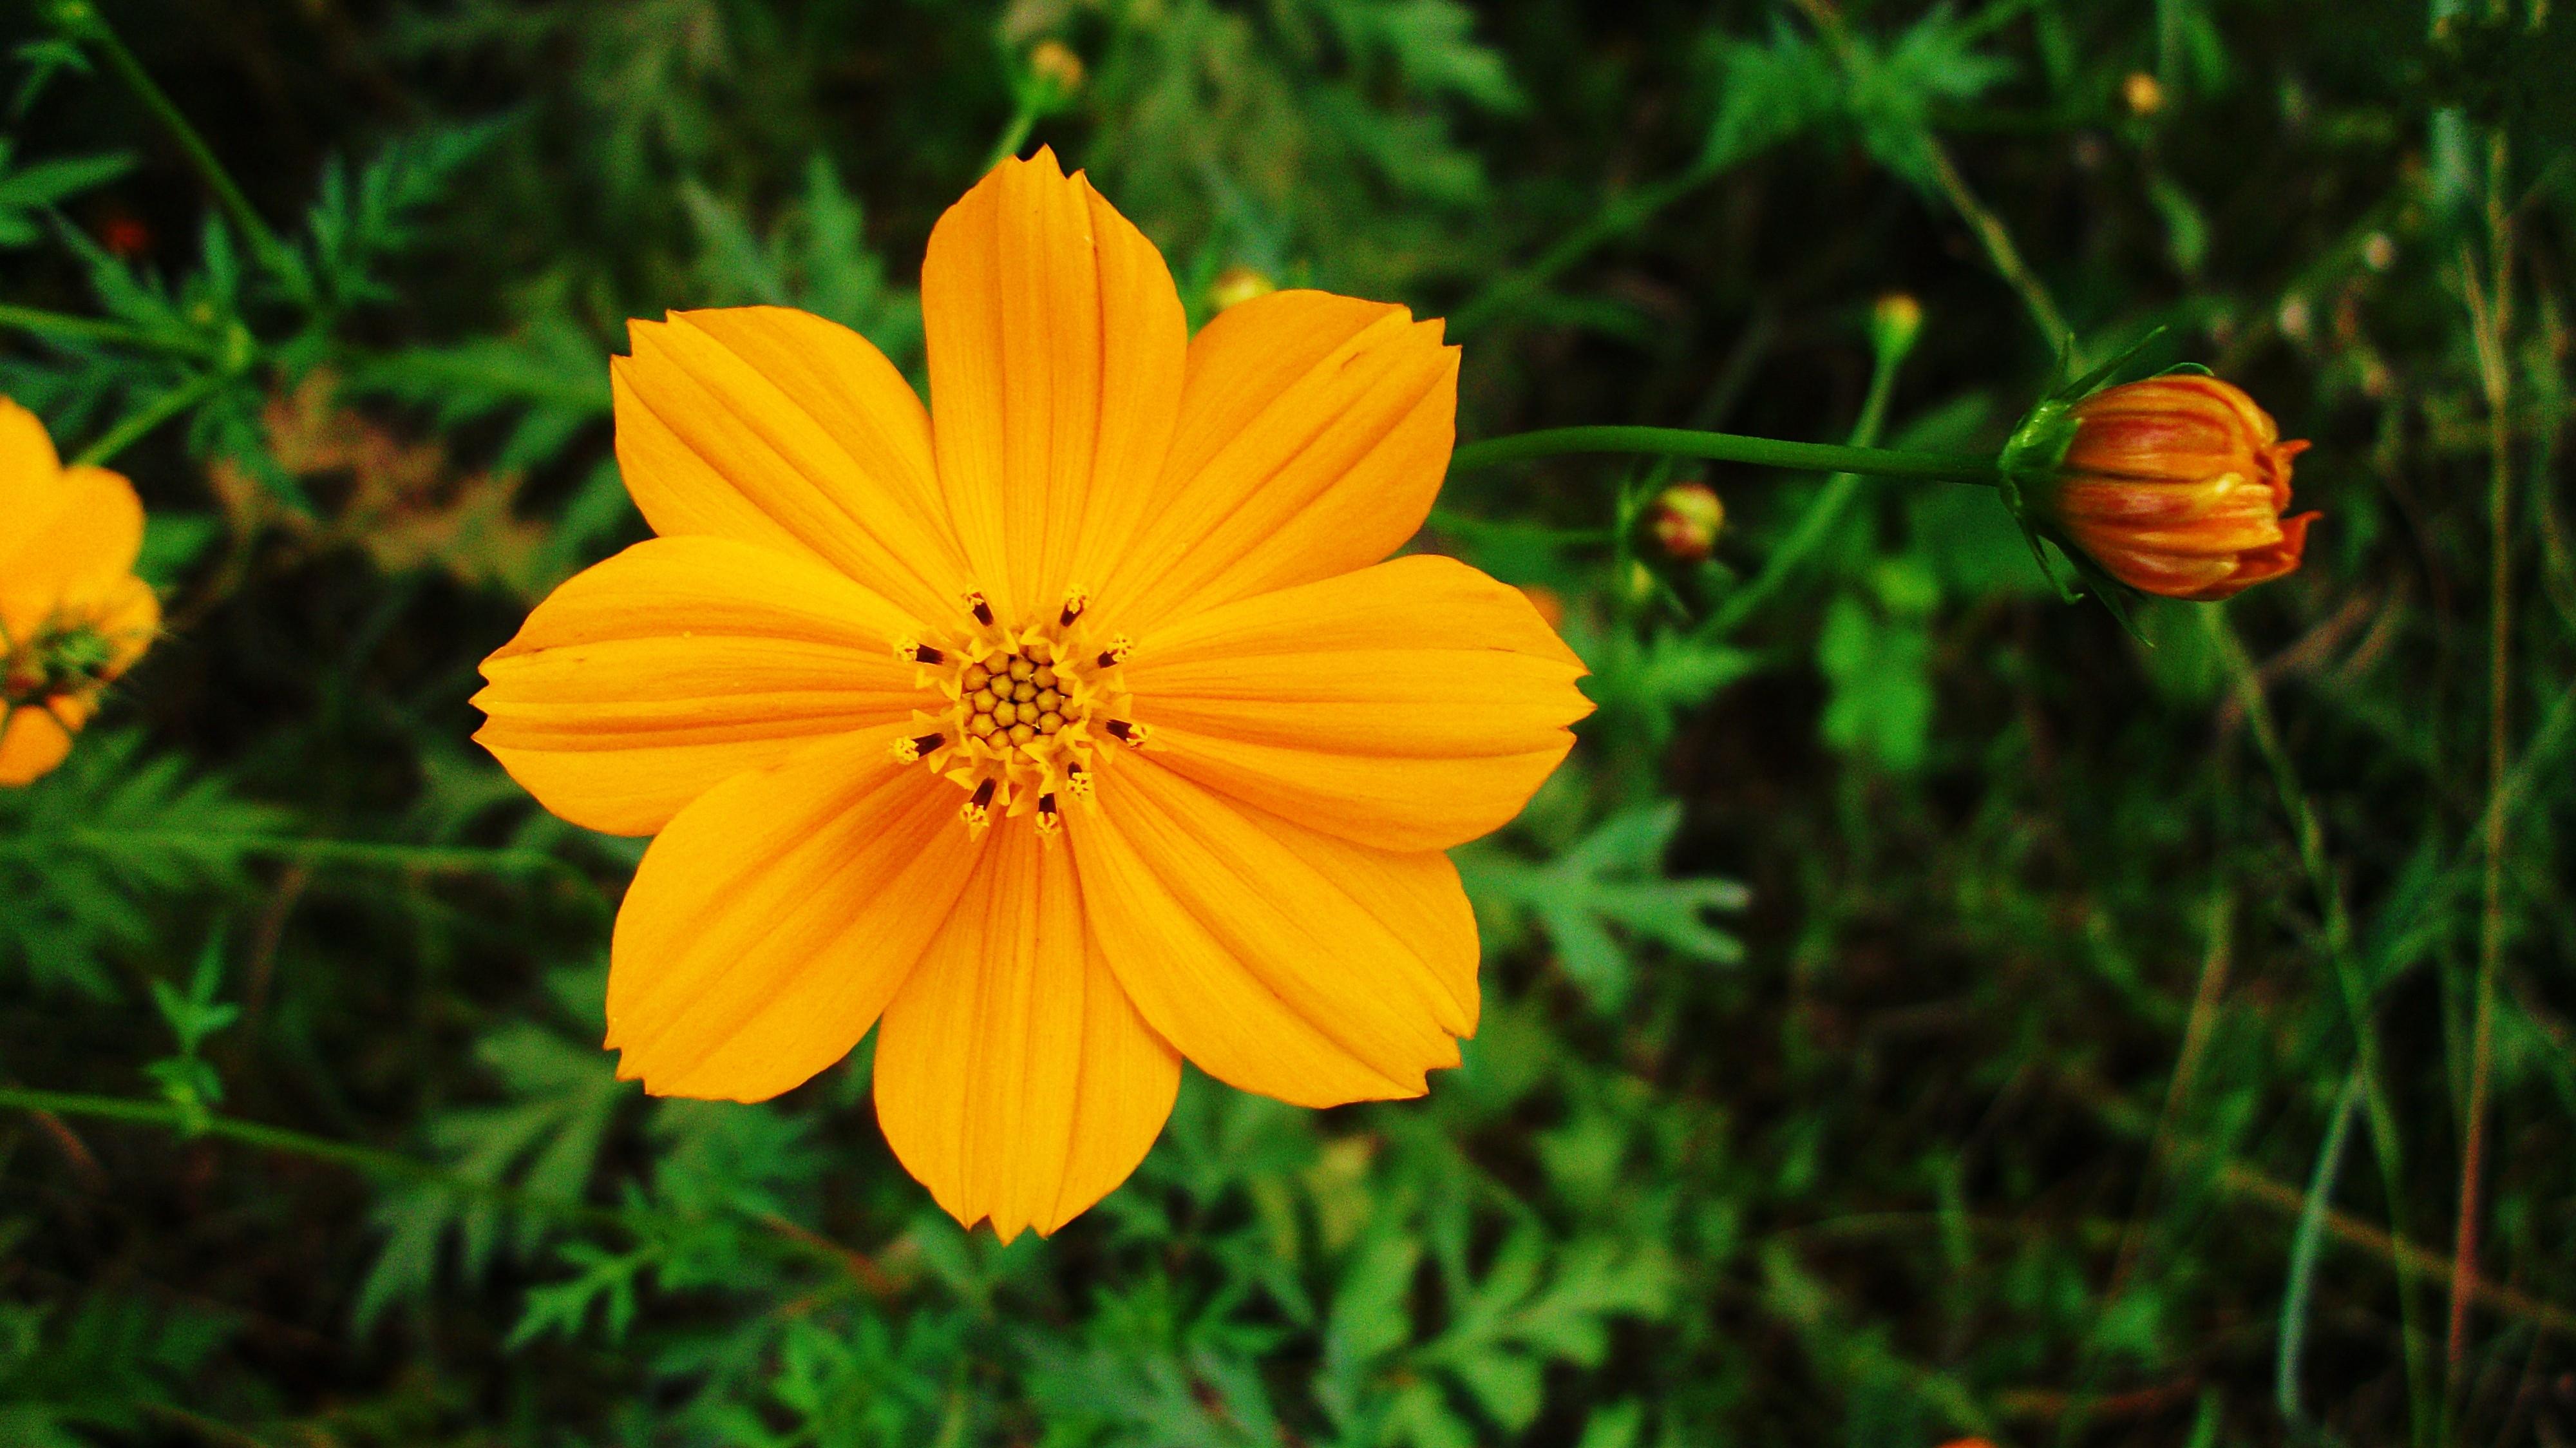 Golden Flower 4k Ultra HD Wallpaper | Background Image | 4000x2248